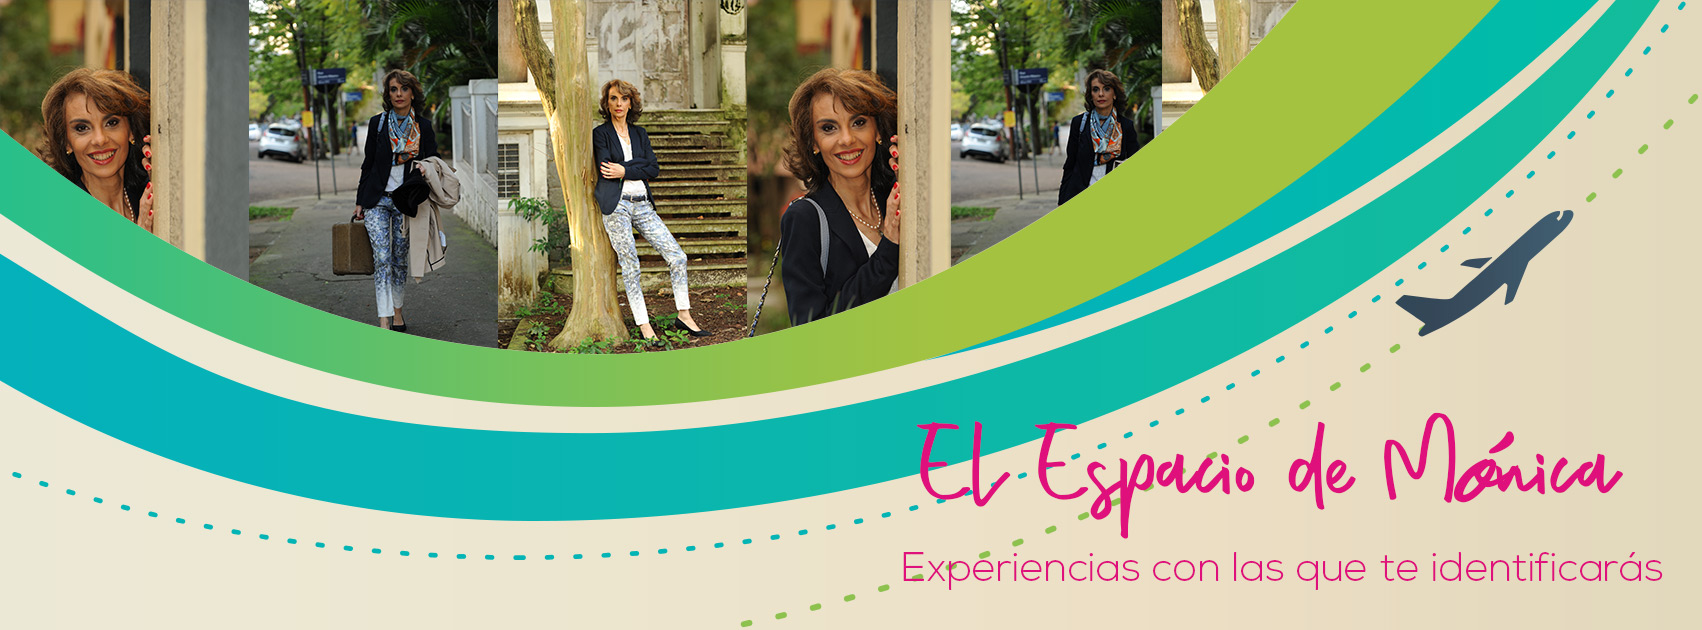 blog viajeros mexico colombia brasil